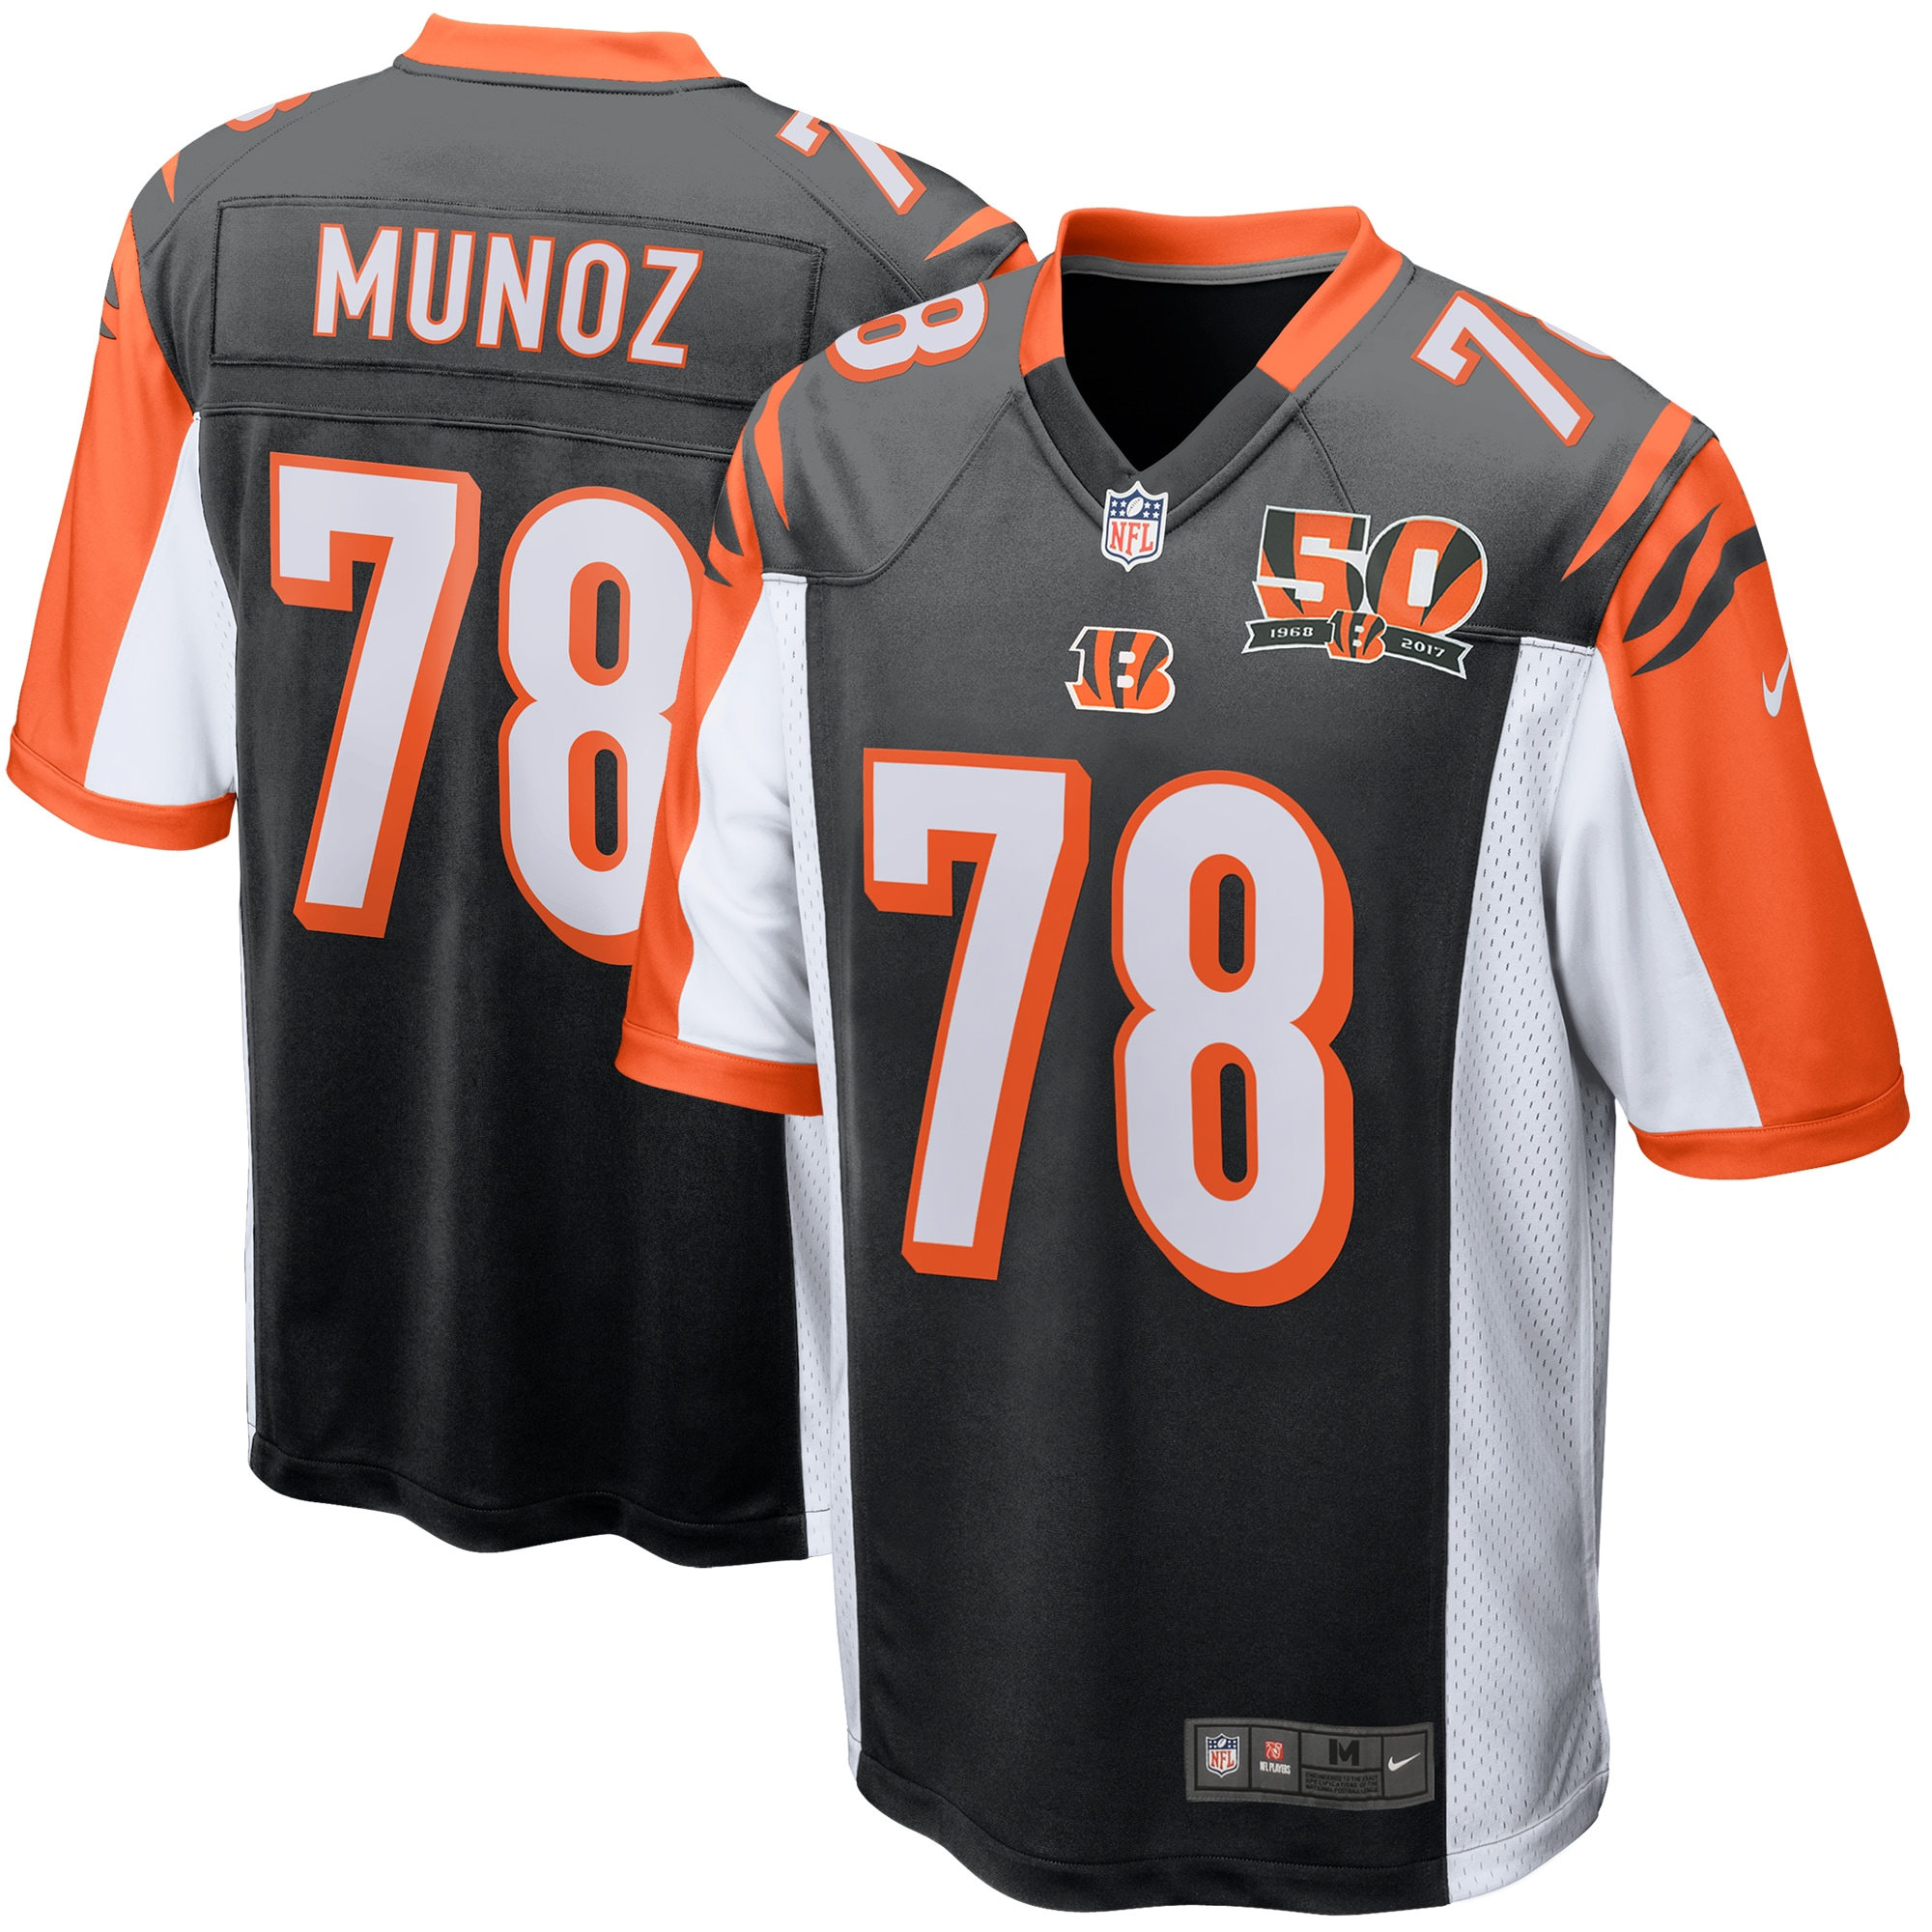 Anthony Munoz Cincinnati Bengals Nike 50th Anniversary Retired Player Game Jersey - Black - Walmart.com